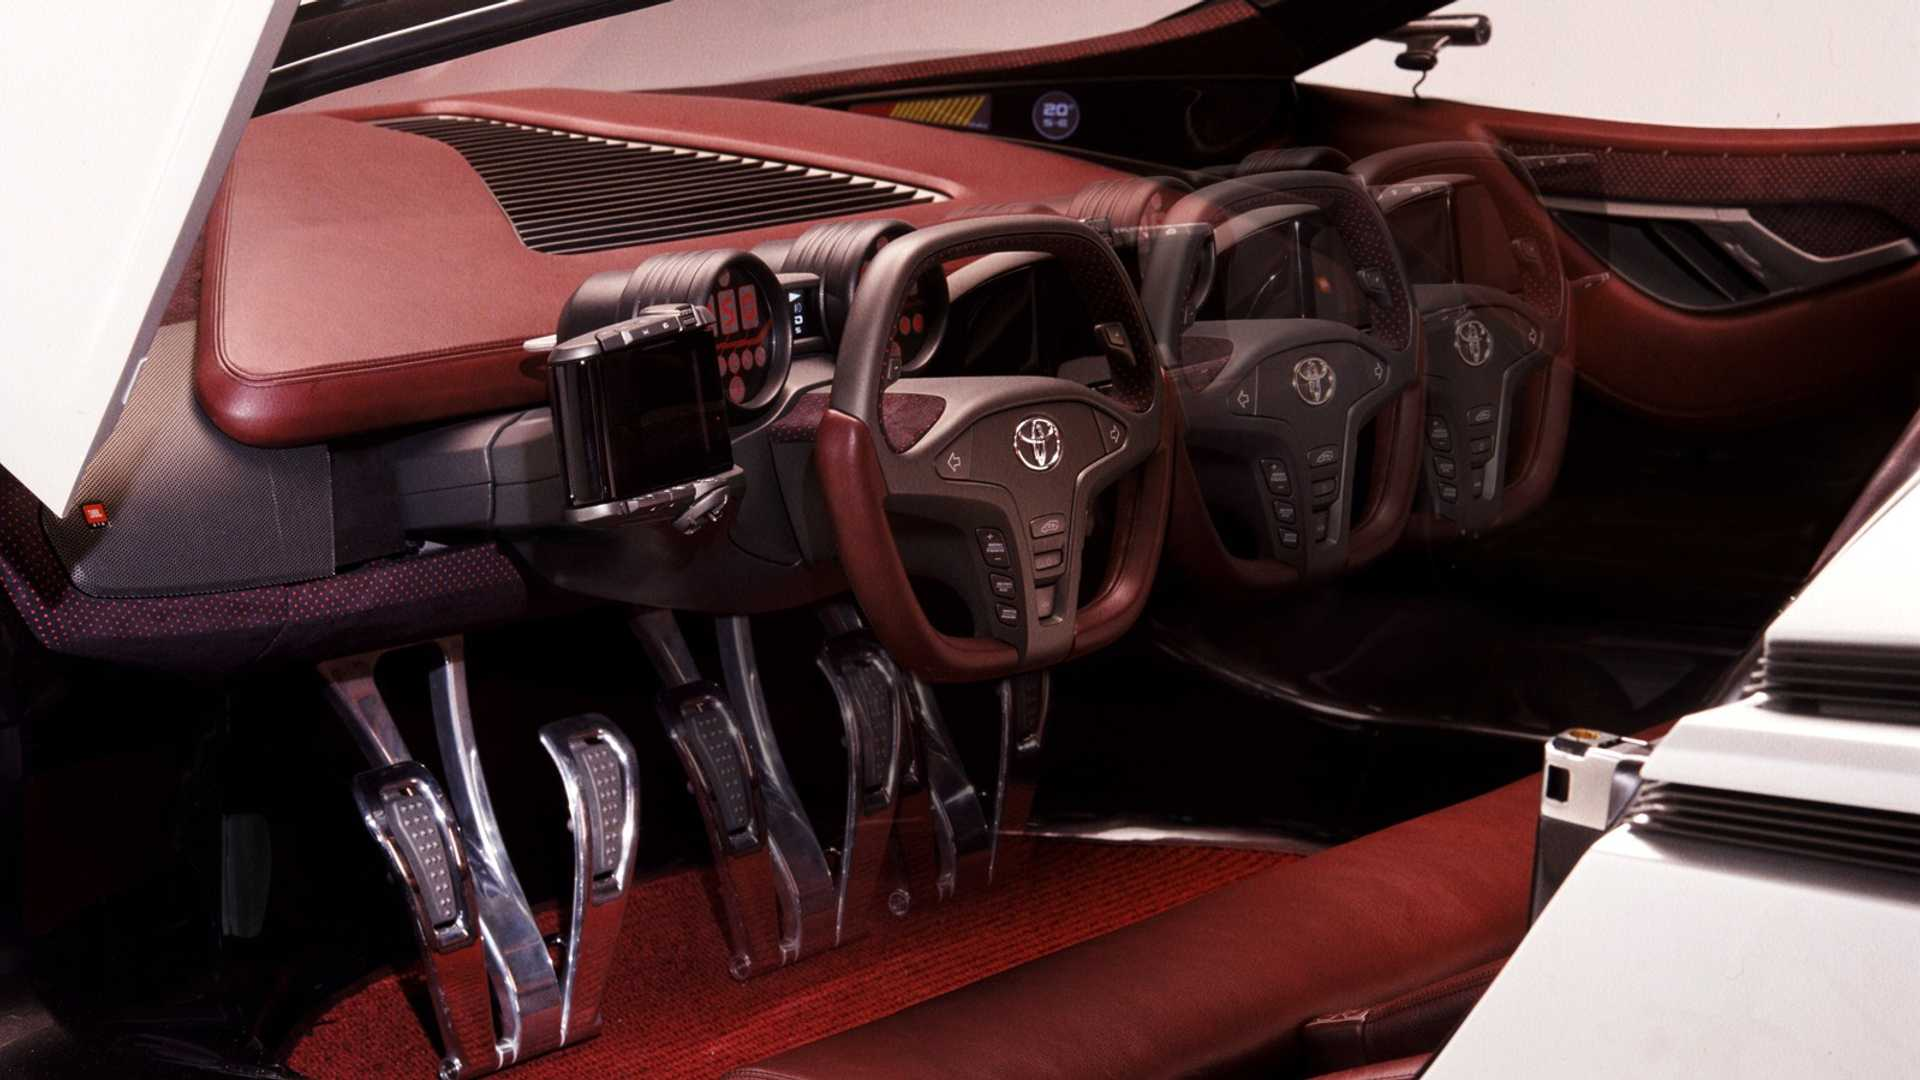 Toyota-Alessandro-Volta-concept-2004-22